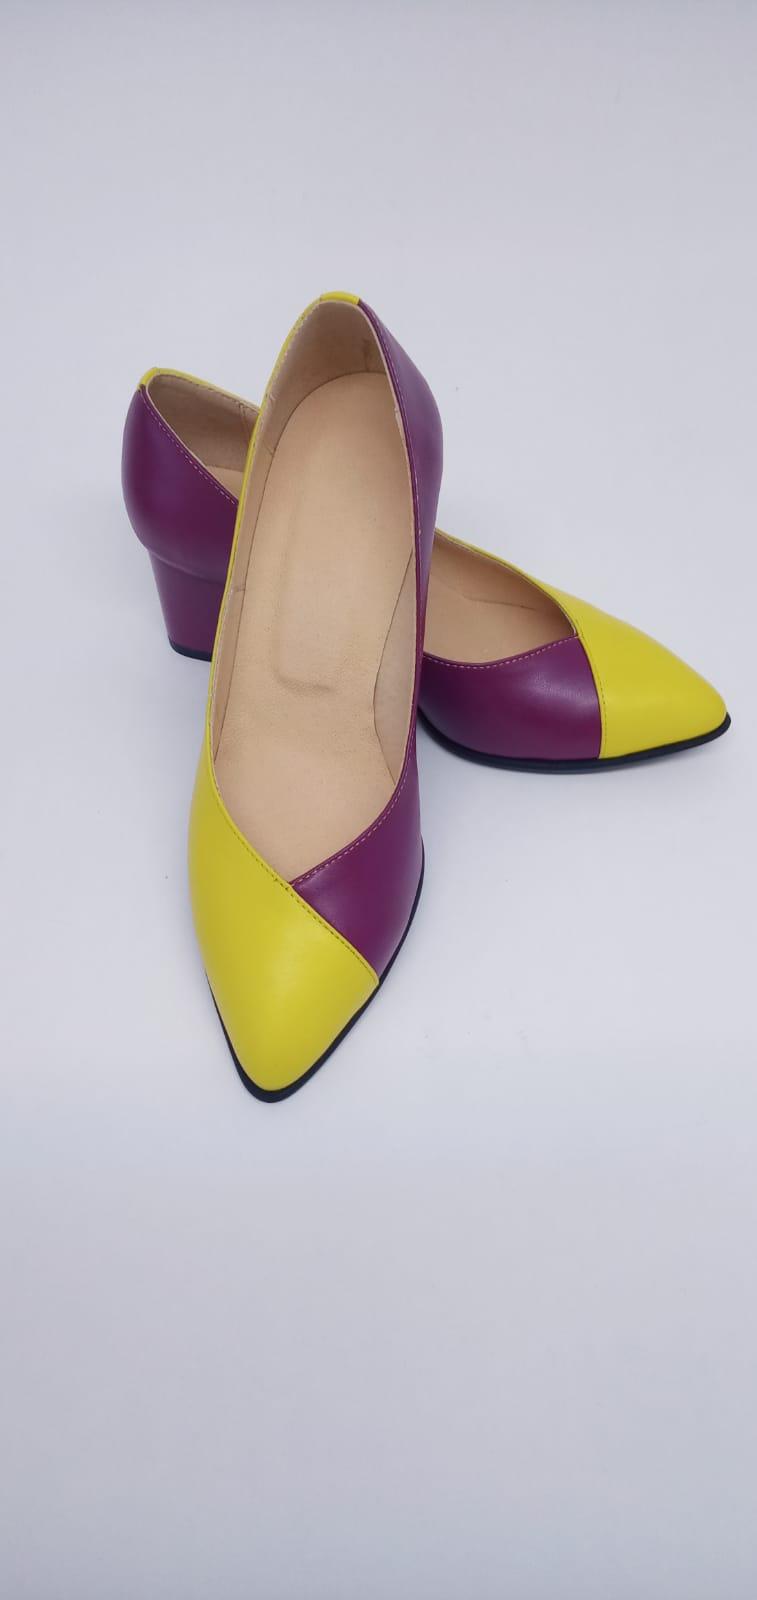 Pantofi galben cu roz din piele naturala